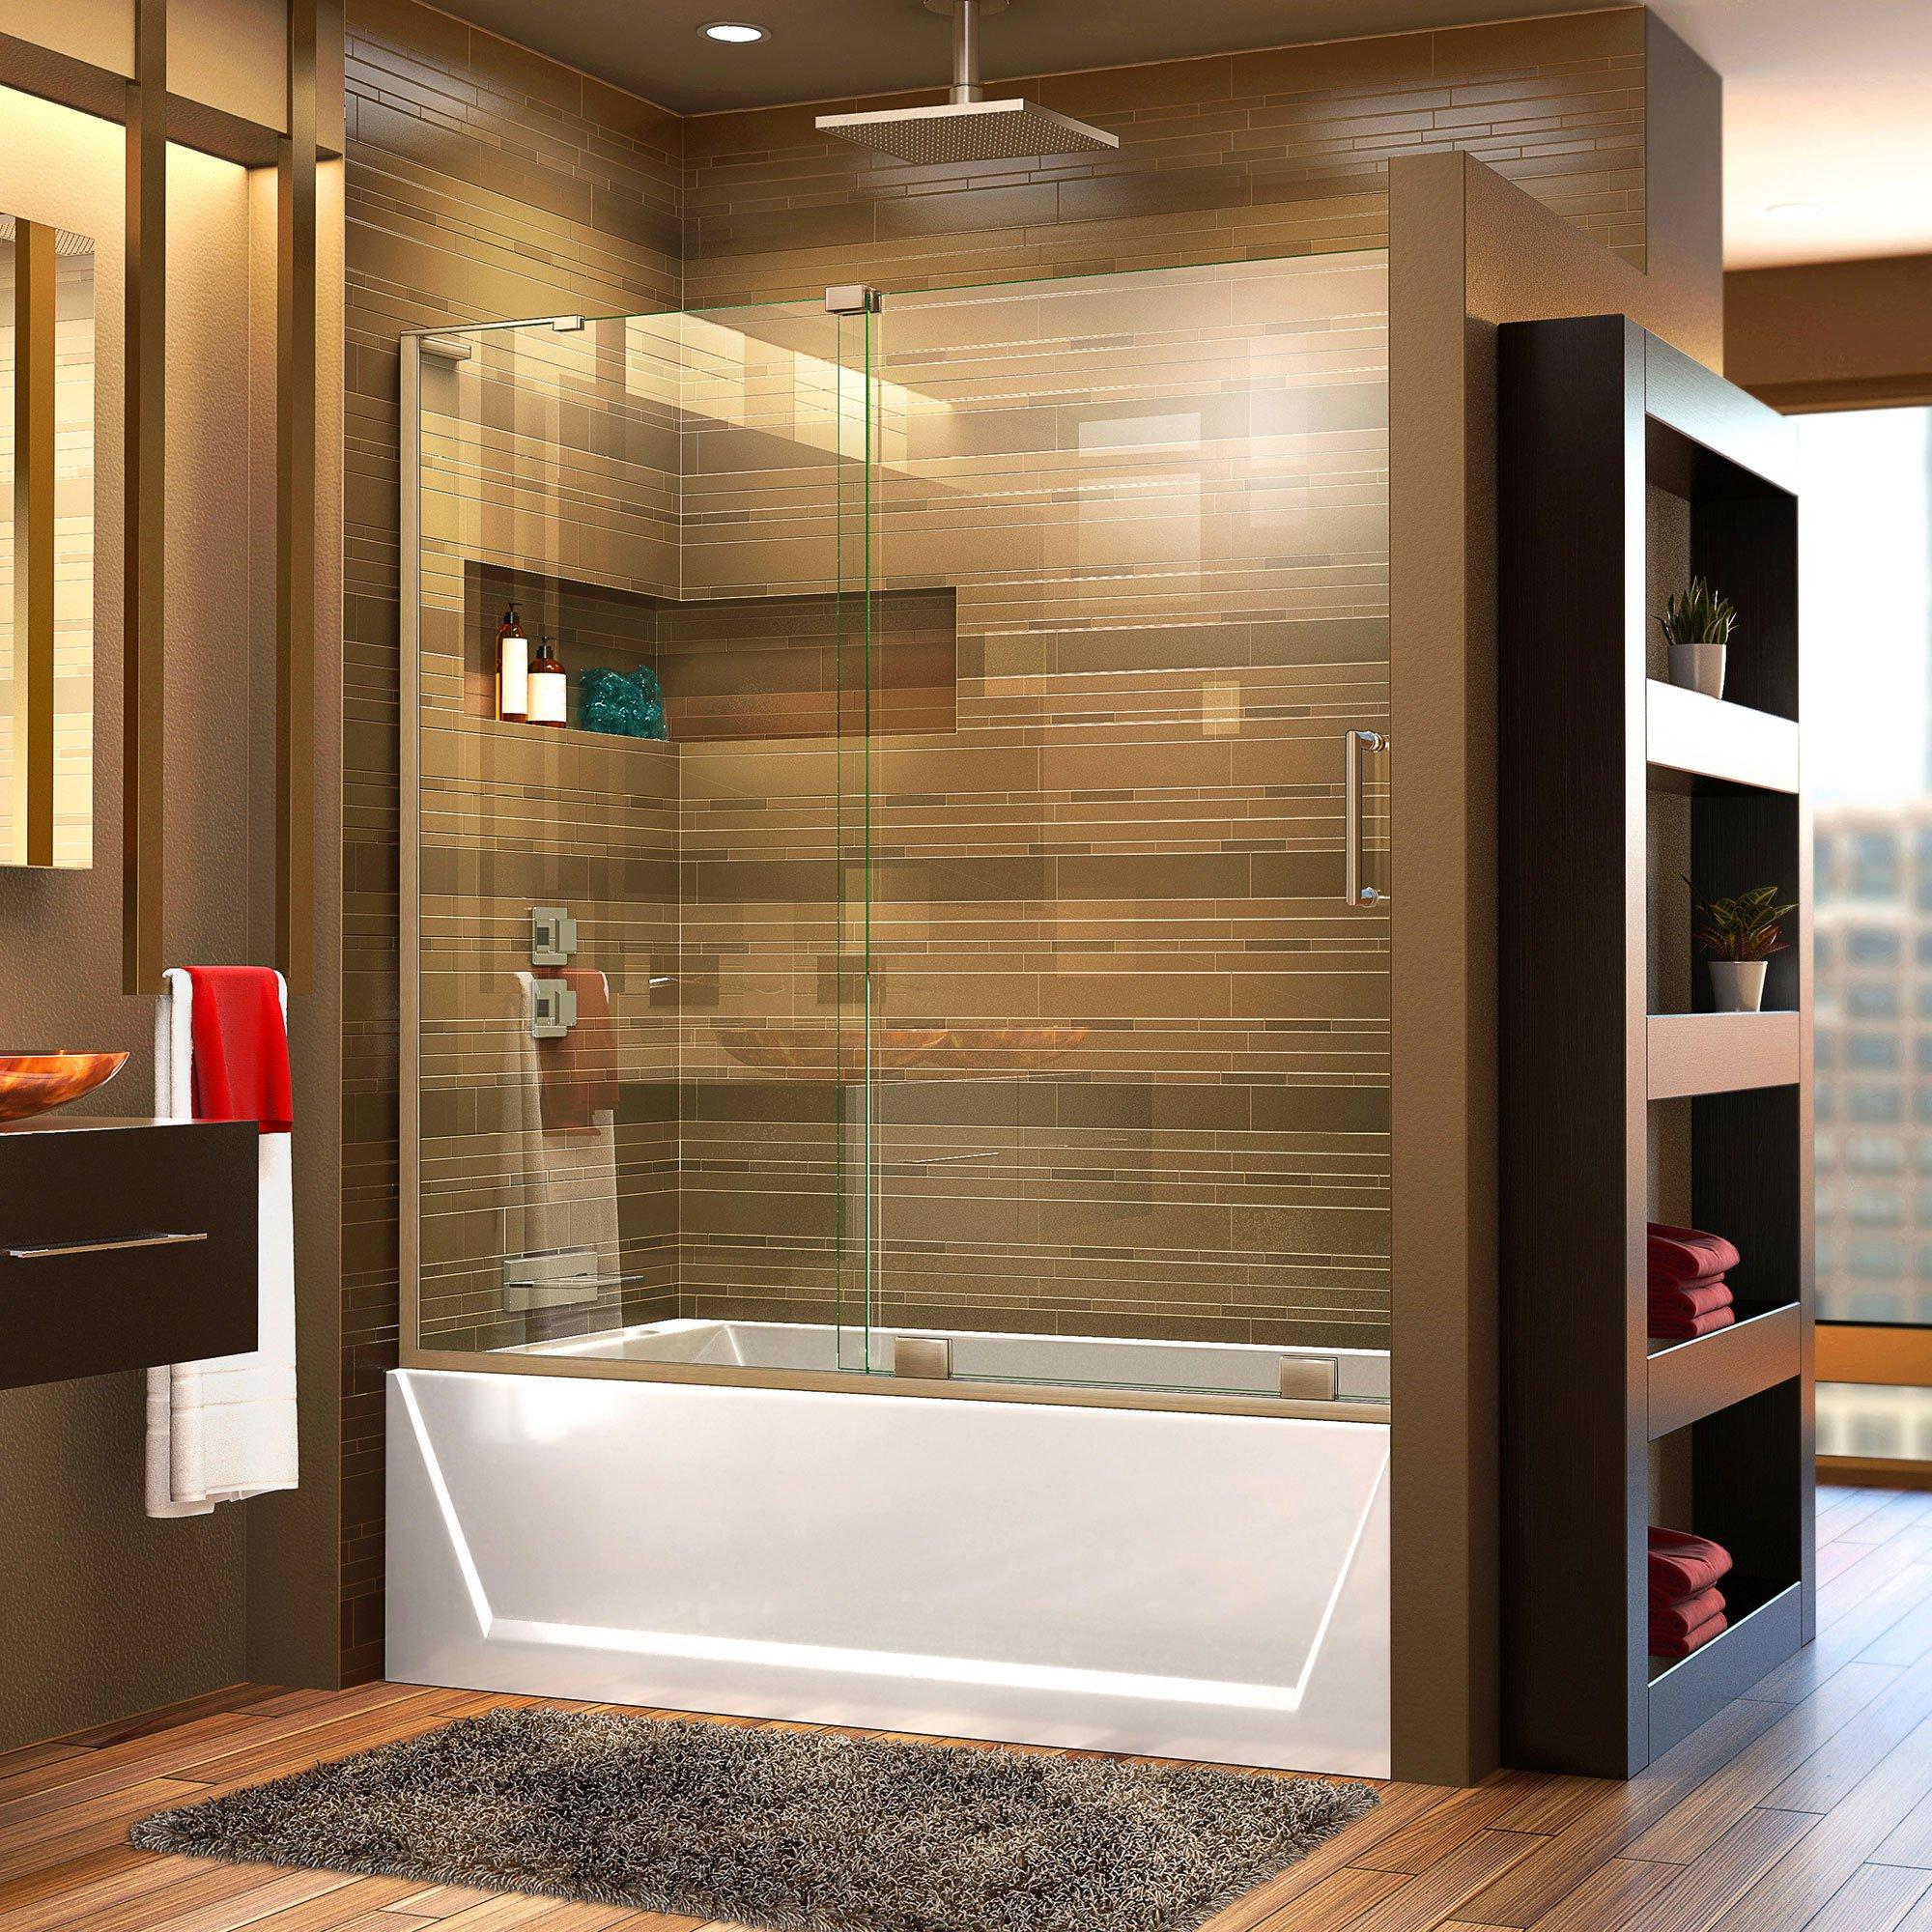 DreamLine Mirage-X 56-60 in. Width, Frameless Sliding Tub Door, 3/8'' Glass, Brushed Nickel Finish